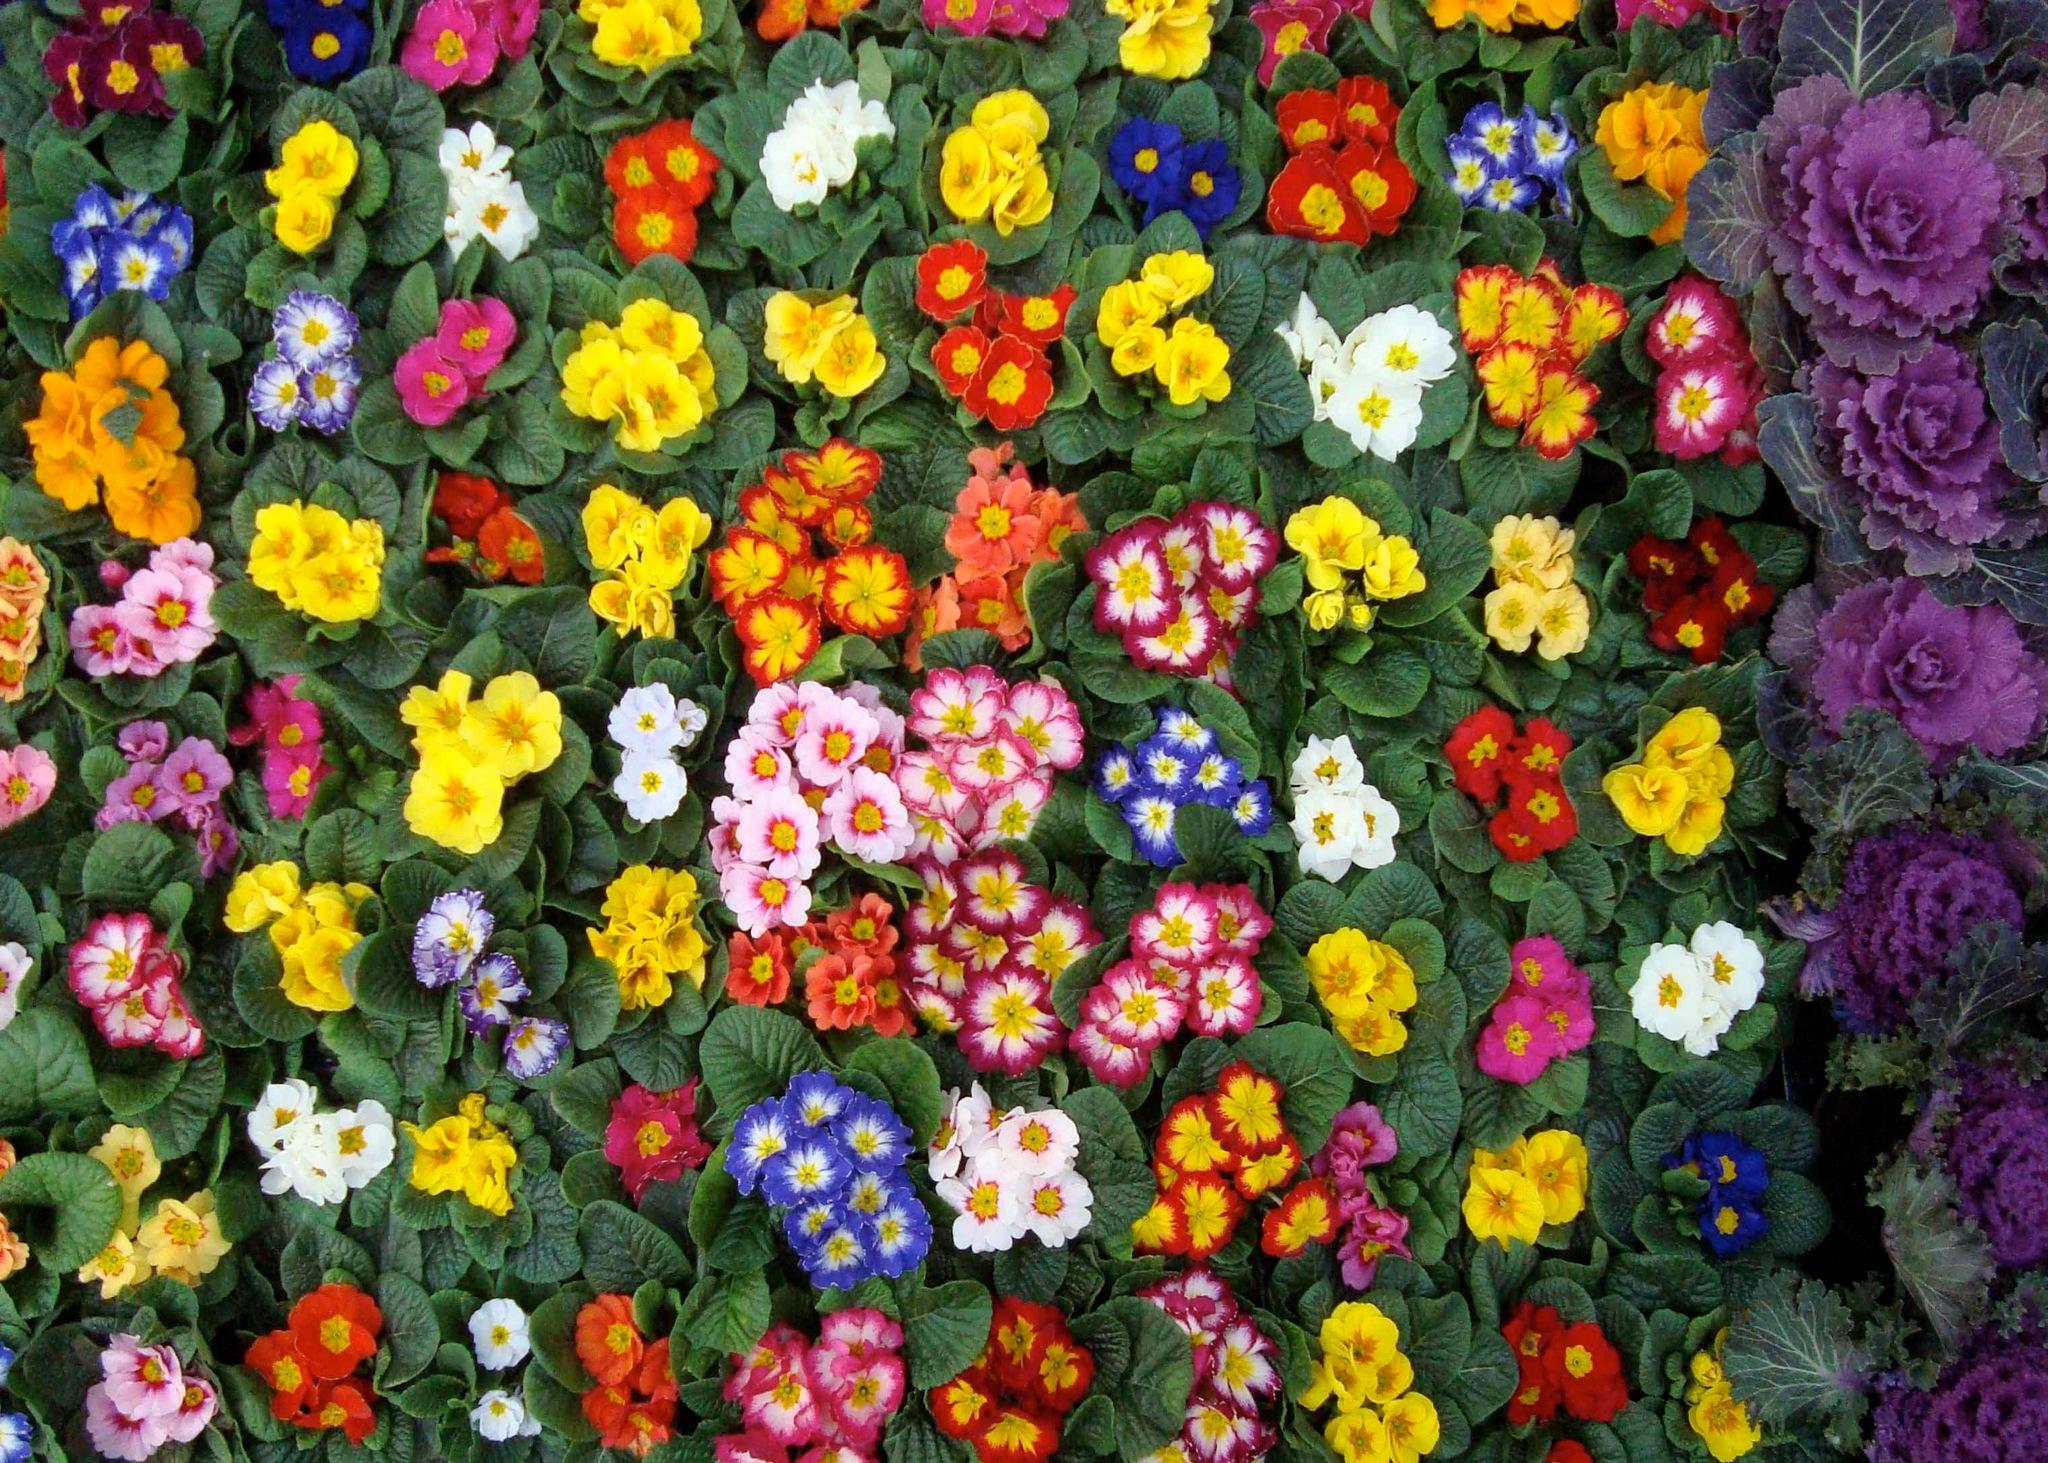 Flower Market, Shoreditch by kfboland125